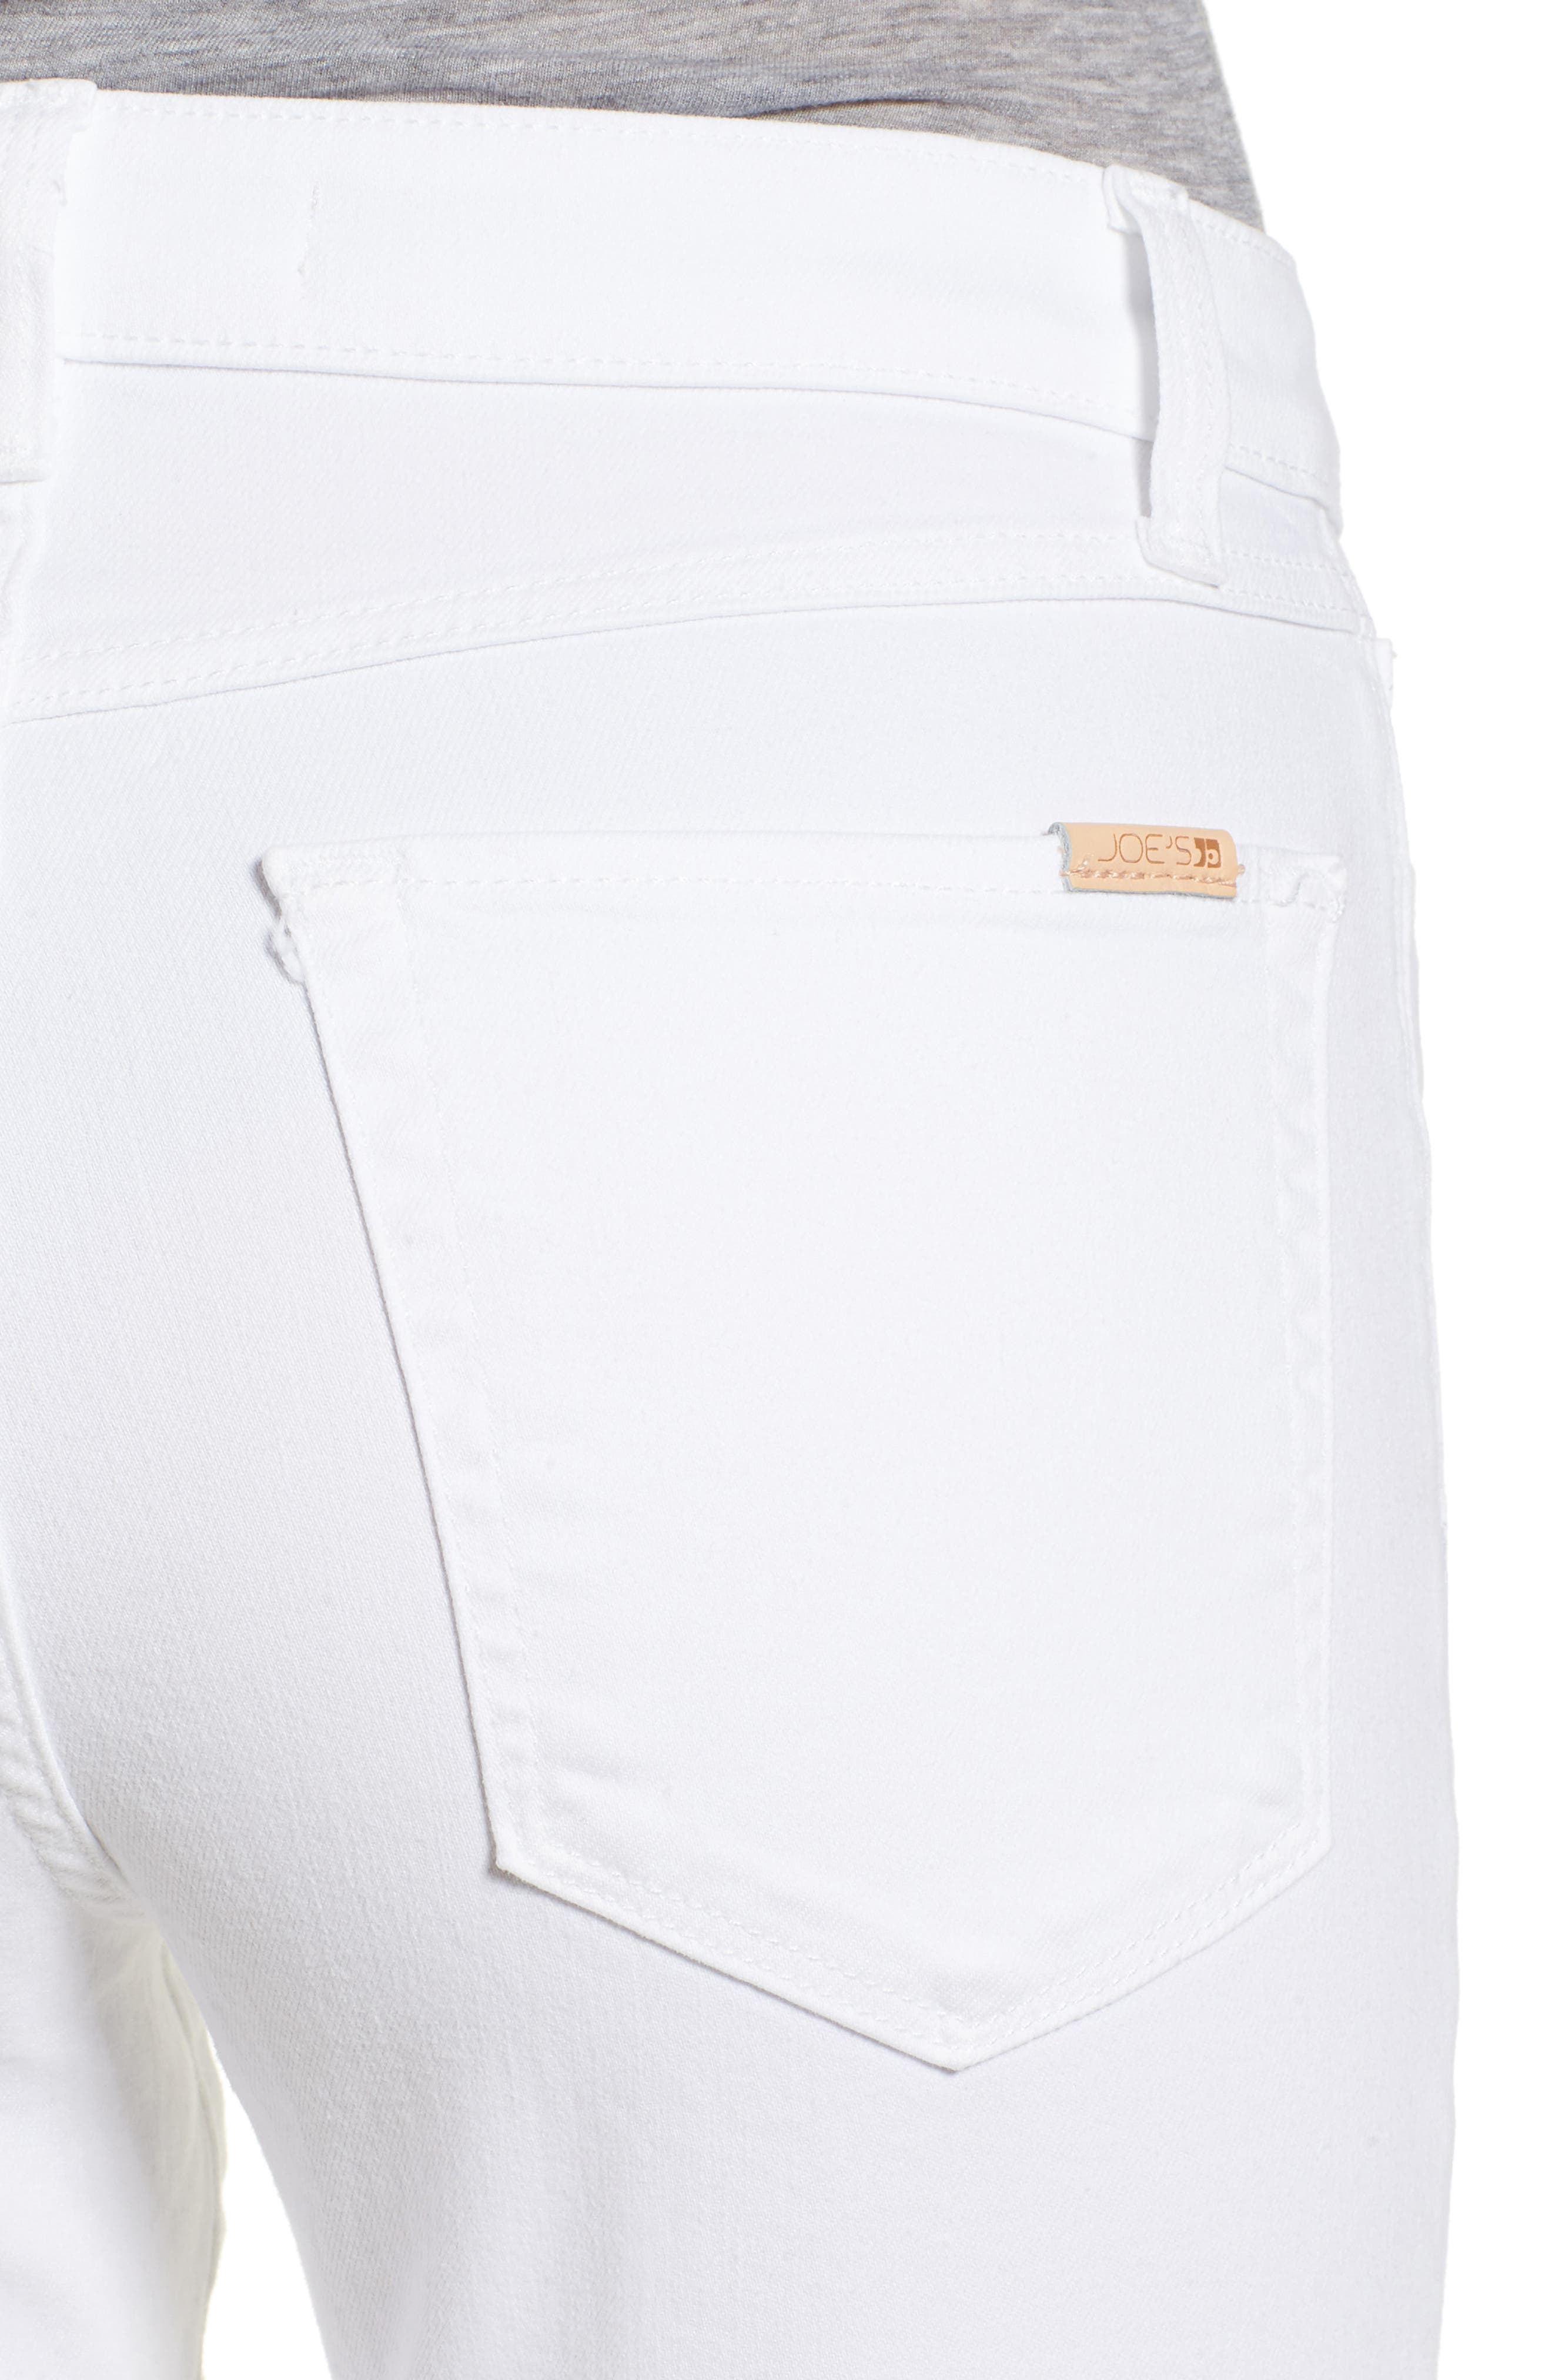 Charlie Skinny Jeans,                             Alternate thumbnail 4, color,                             120